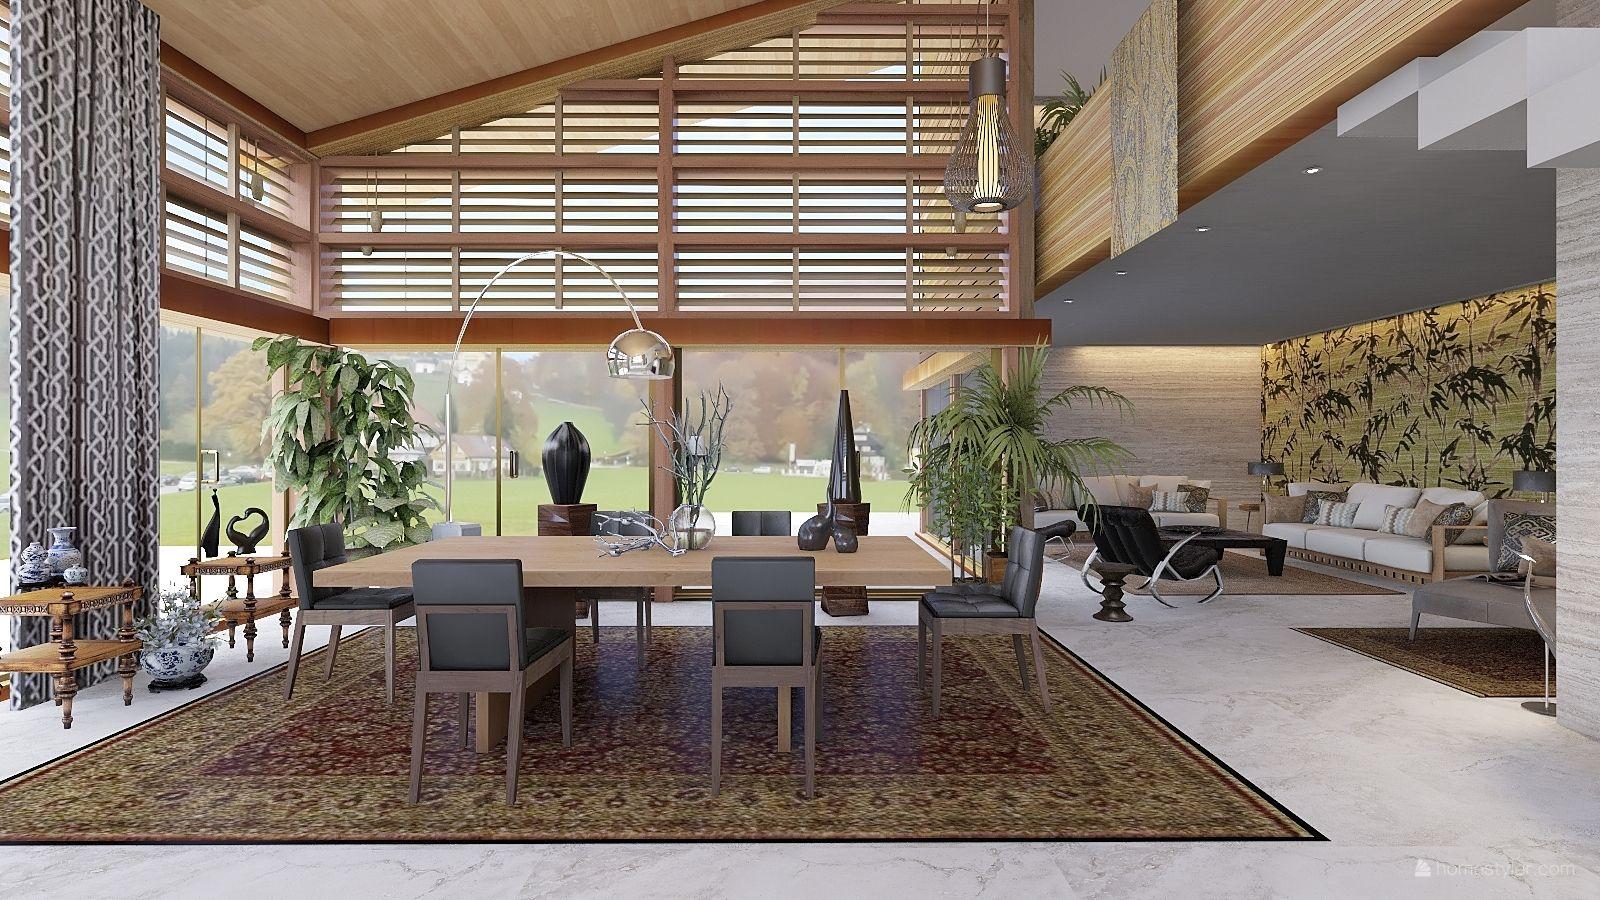 Dining Room Design By Svetlysveva 3d Home Design Software 3d